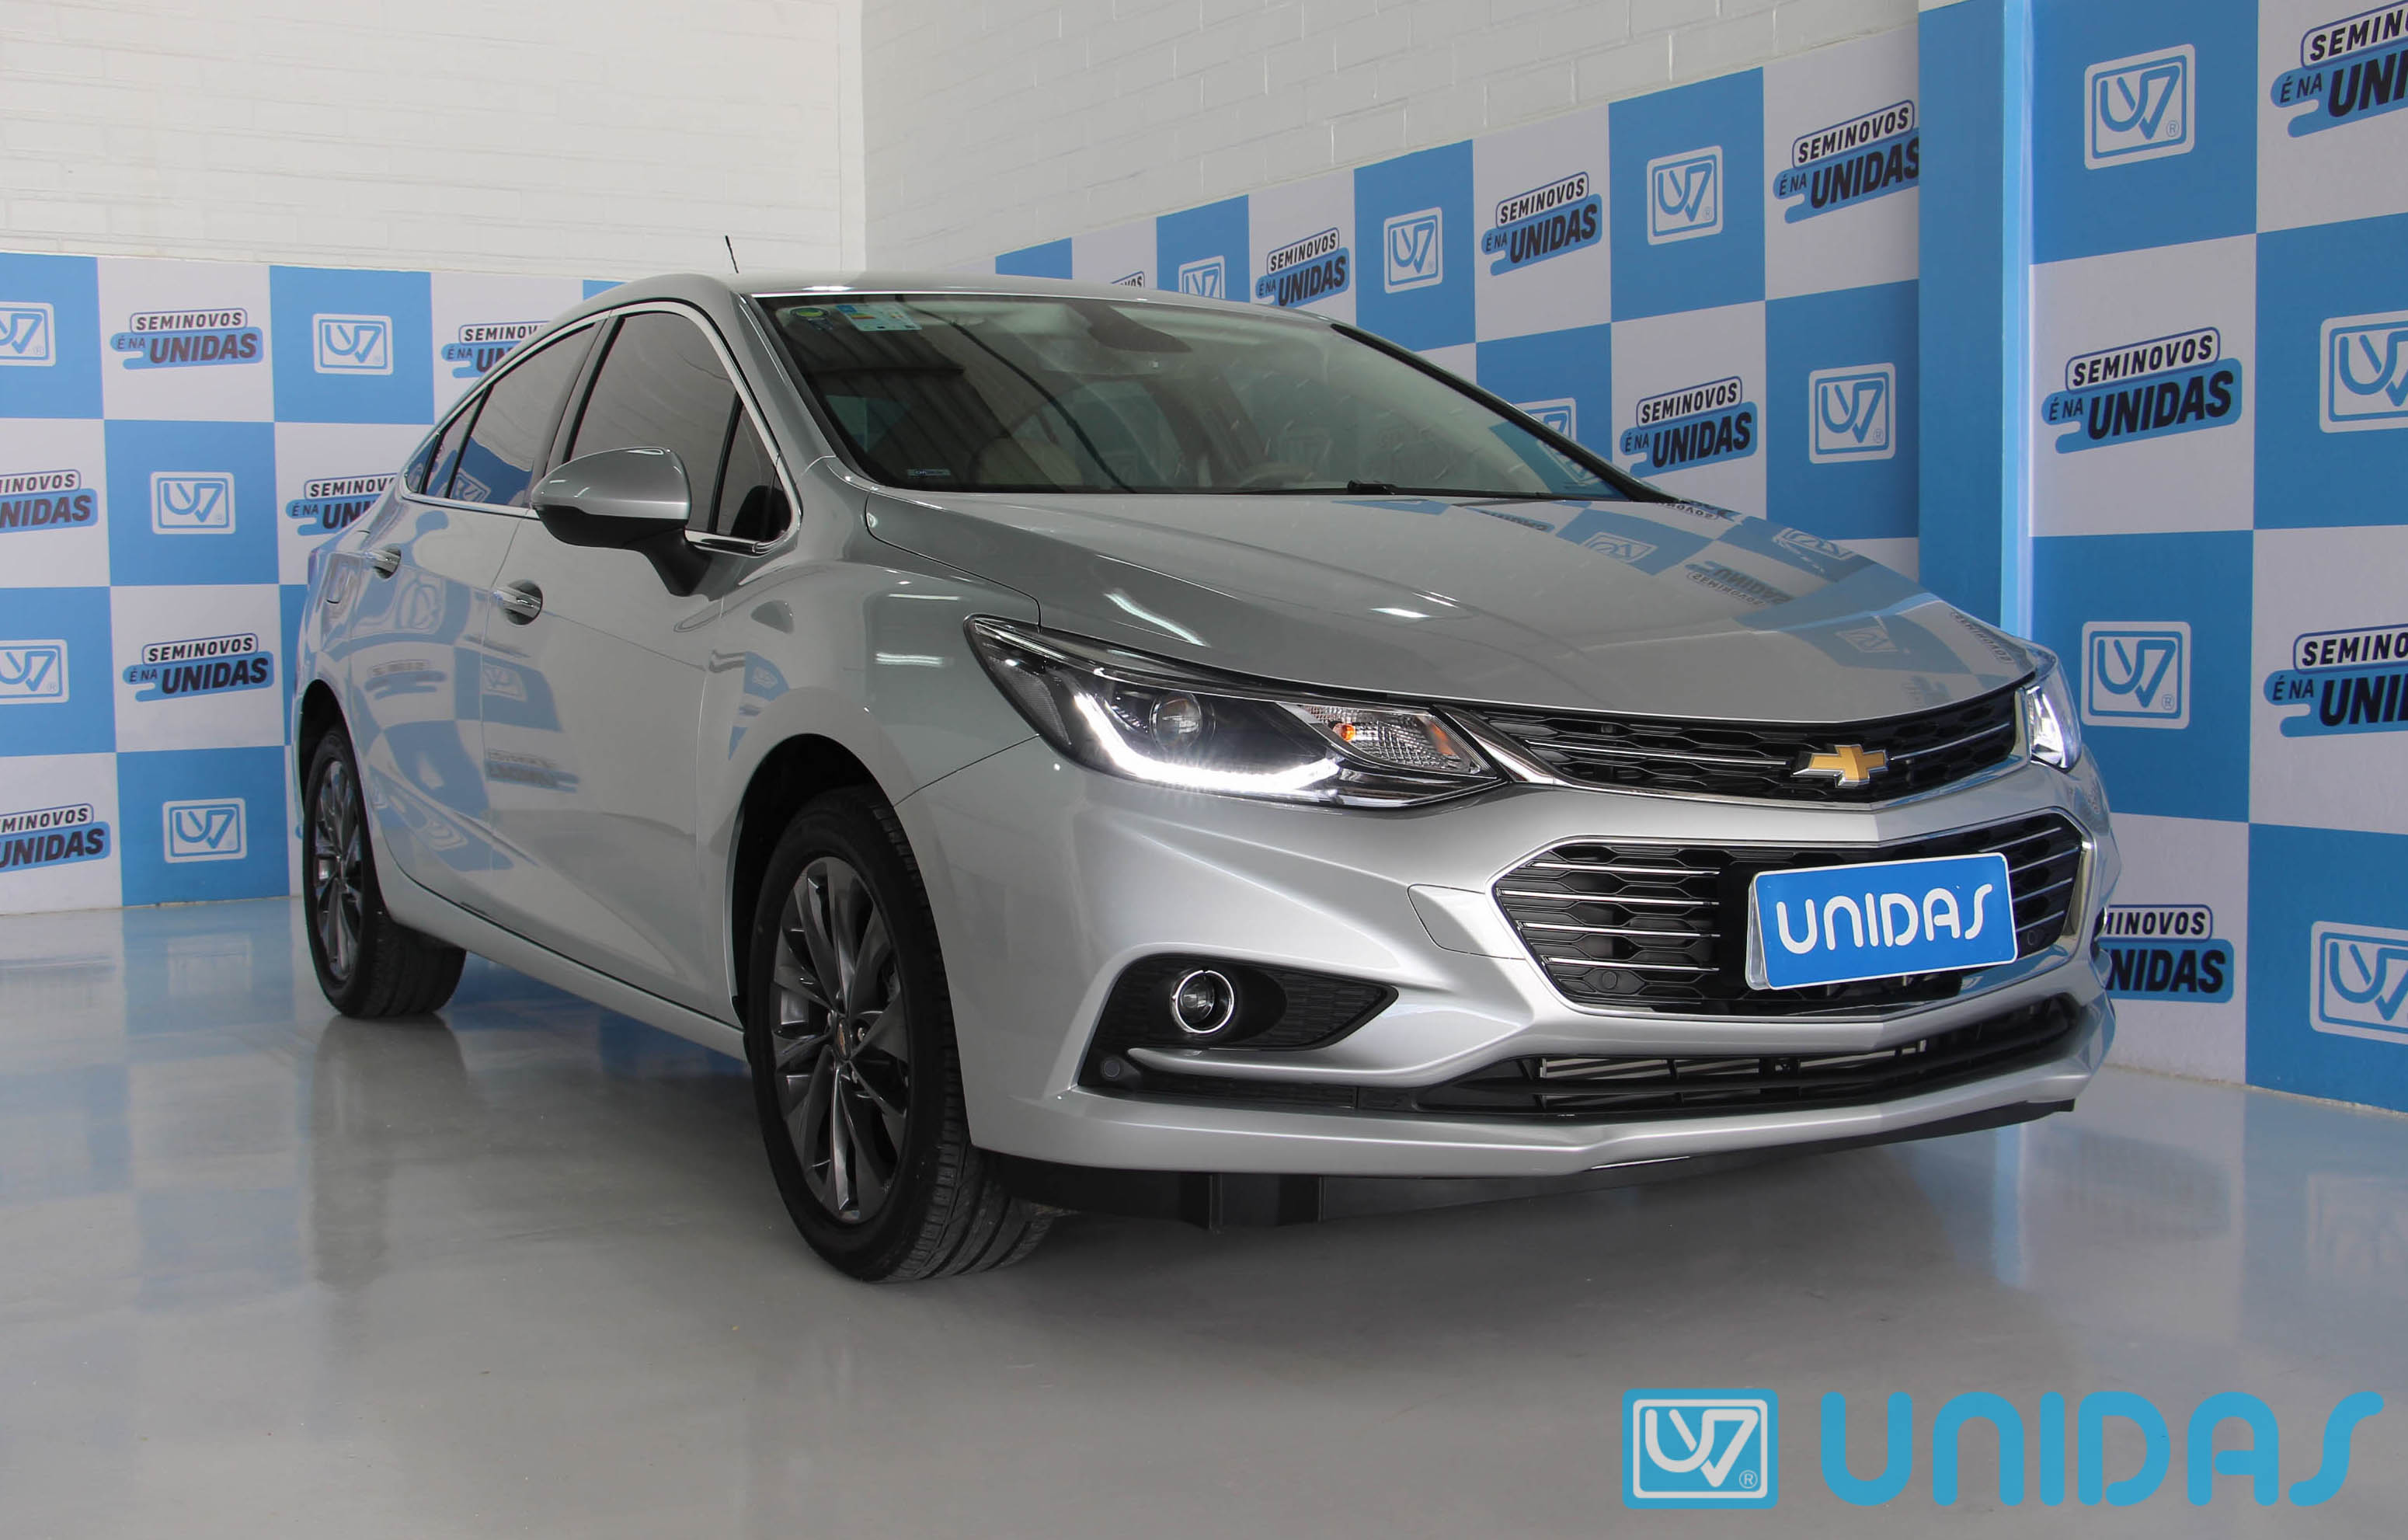 Chevrolet CRUZE LTZ 1.4L 2019